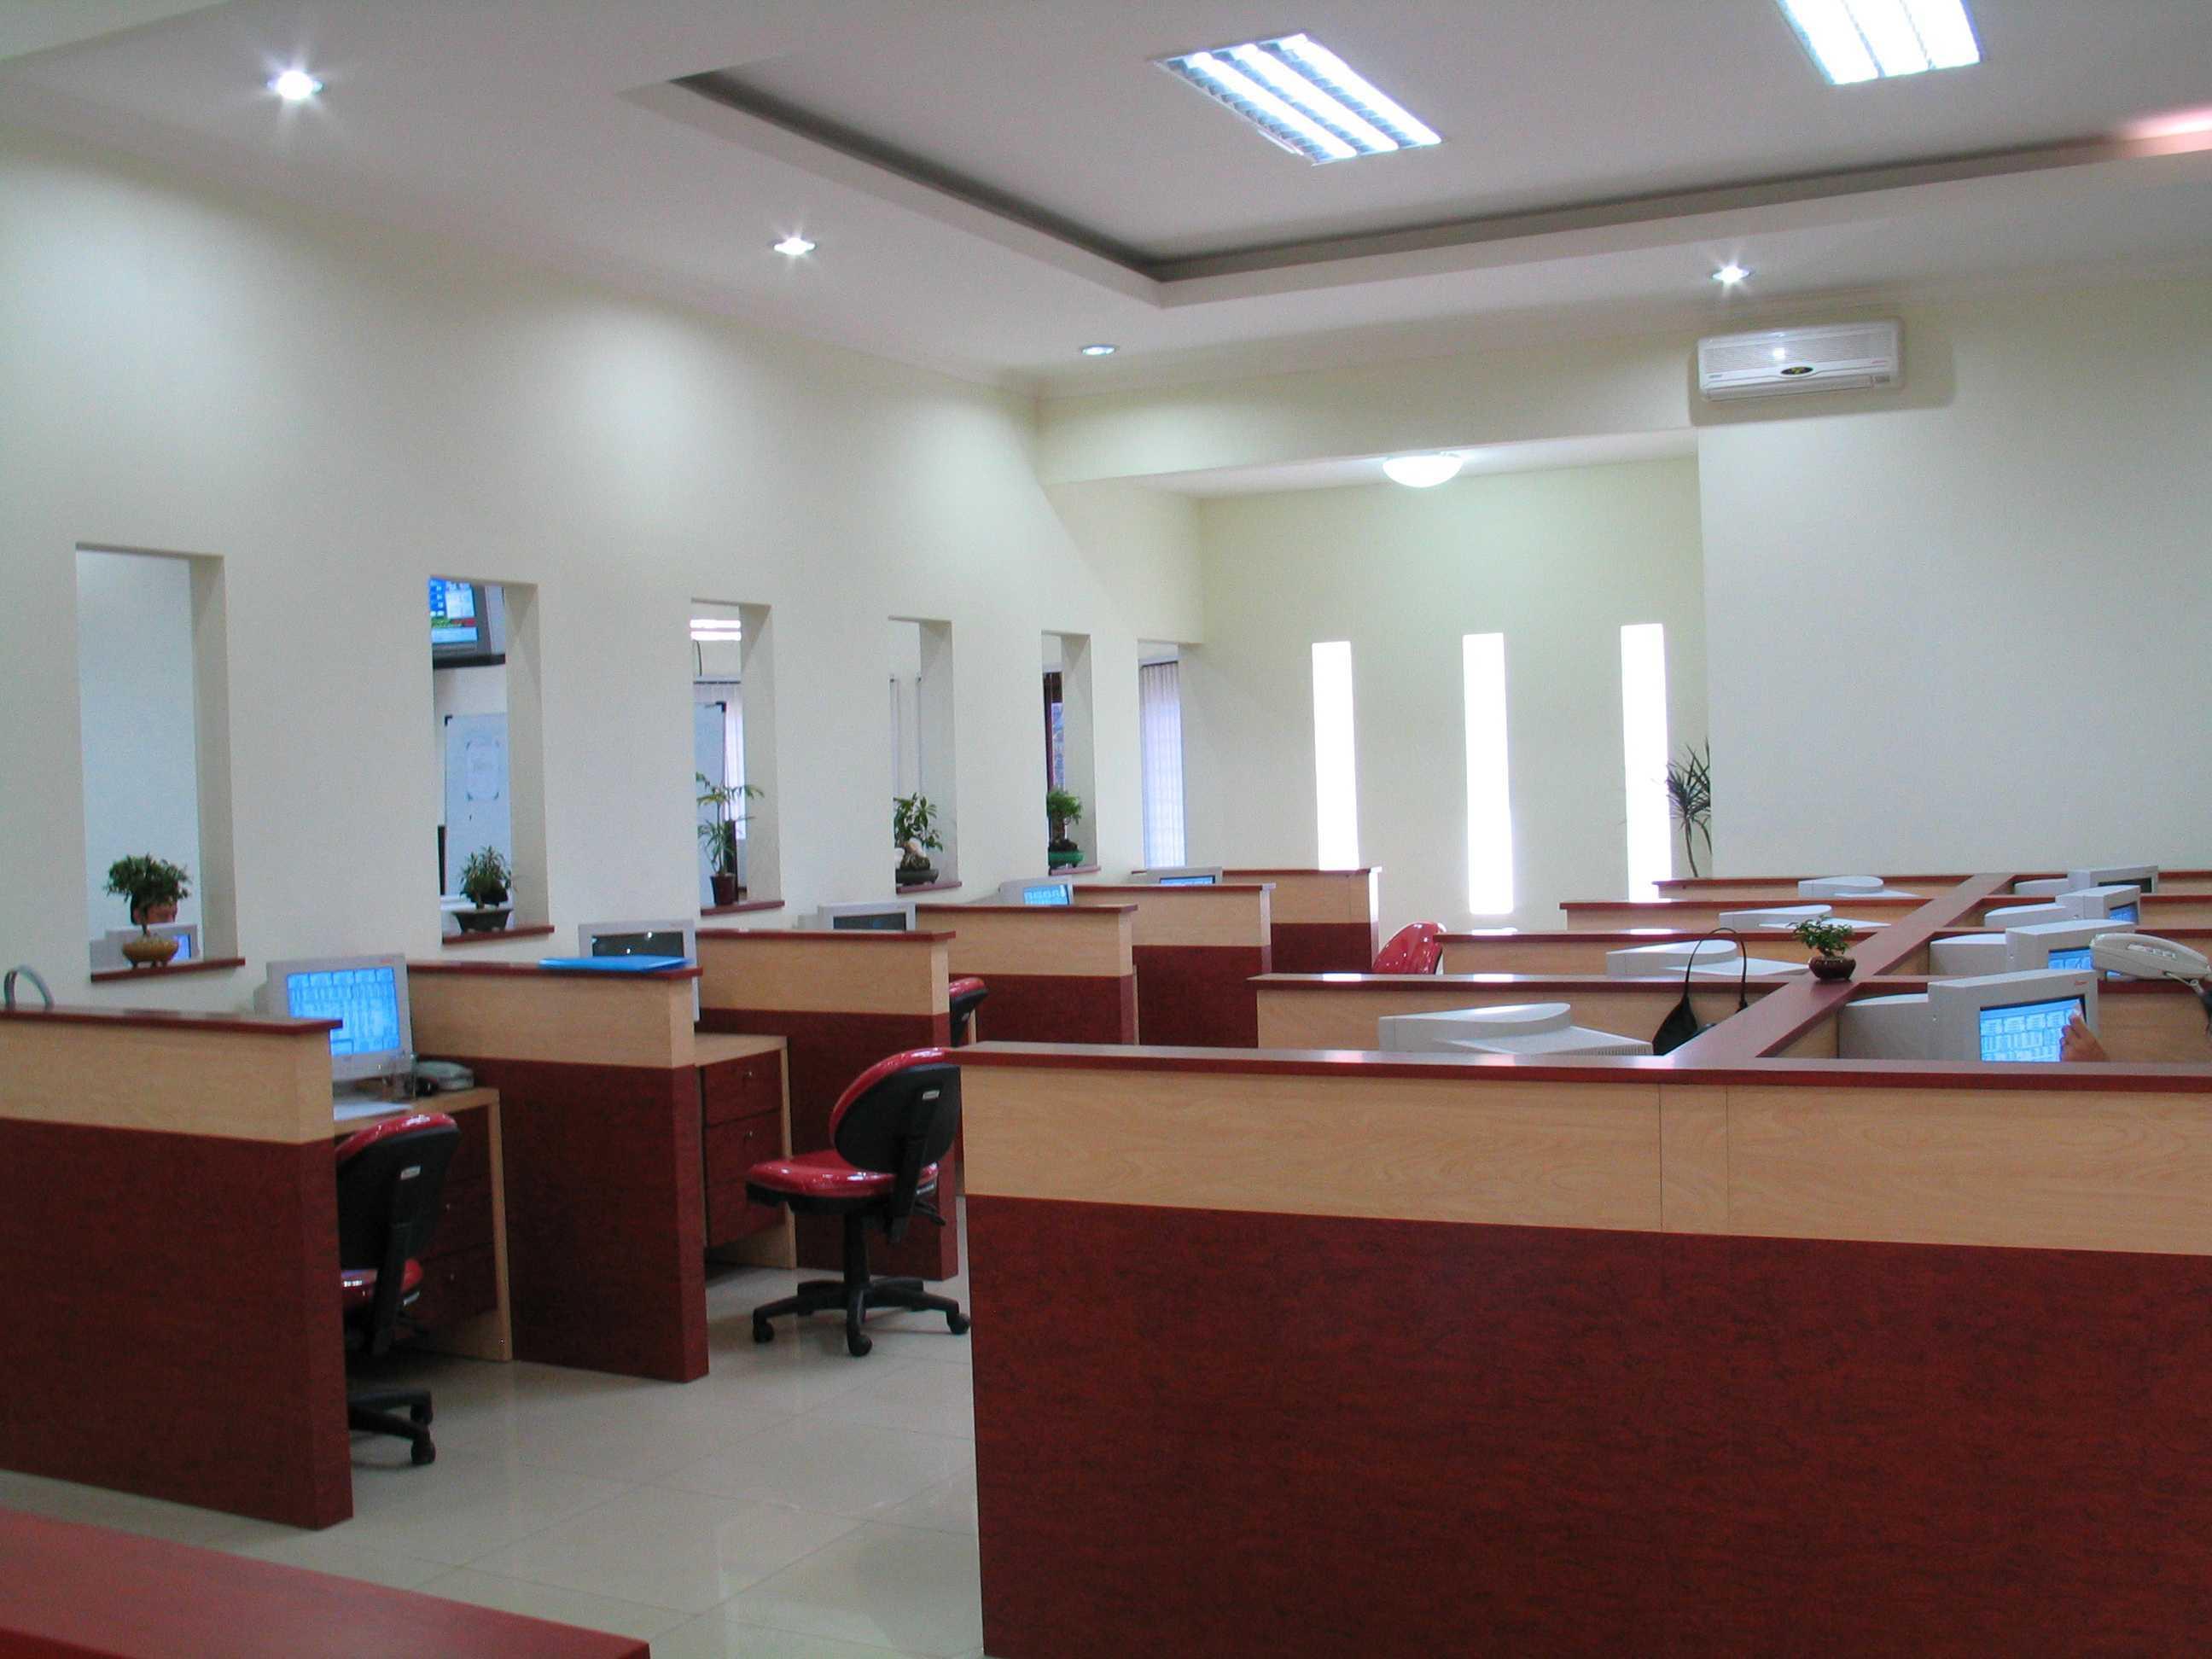 Nextarchitect Renovasi Kantor Monex Investindo Futures Bandung, Kota Bandung, Jawa Barat, Indonesia Bandung, Kota Bandung, Jawa Barat, Indonesia Monex-Final-31   41847